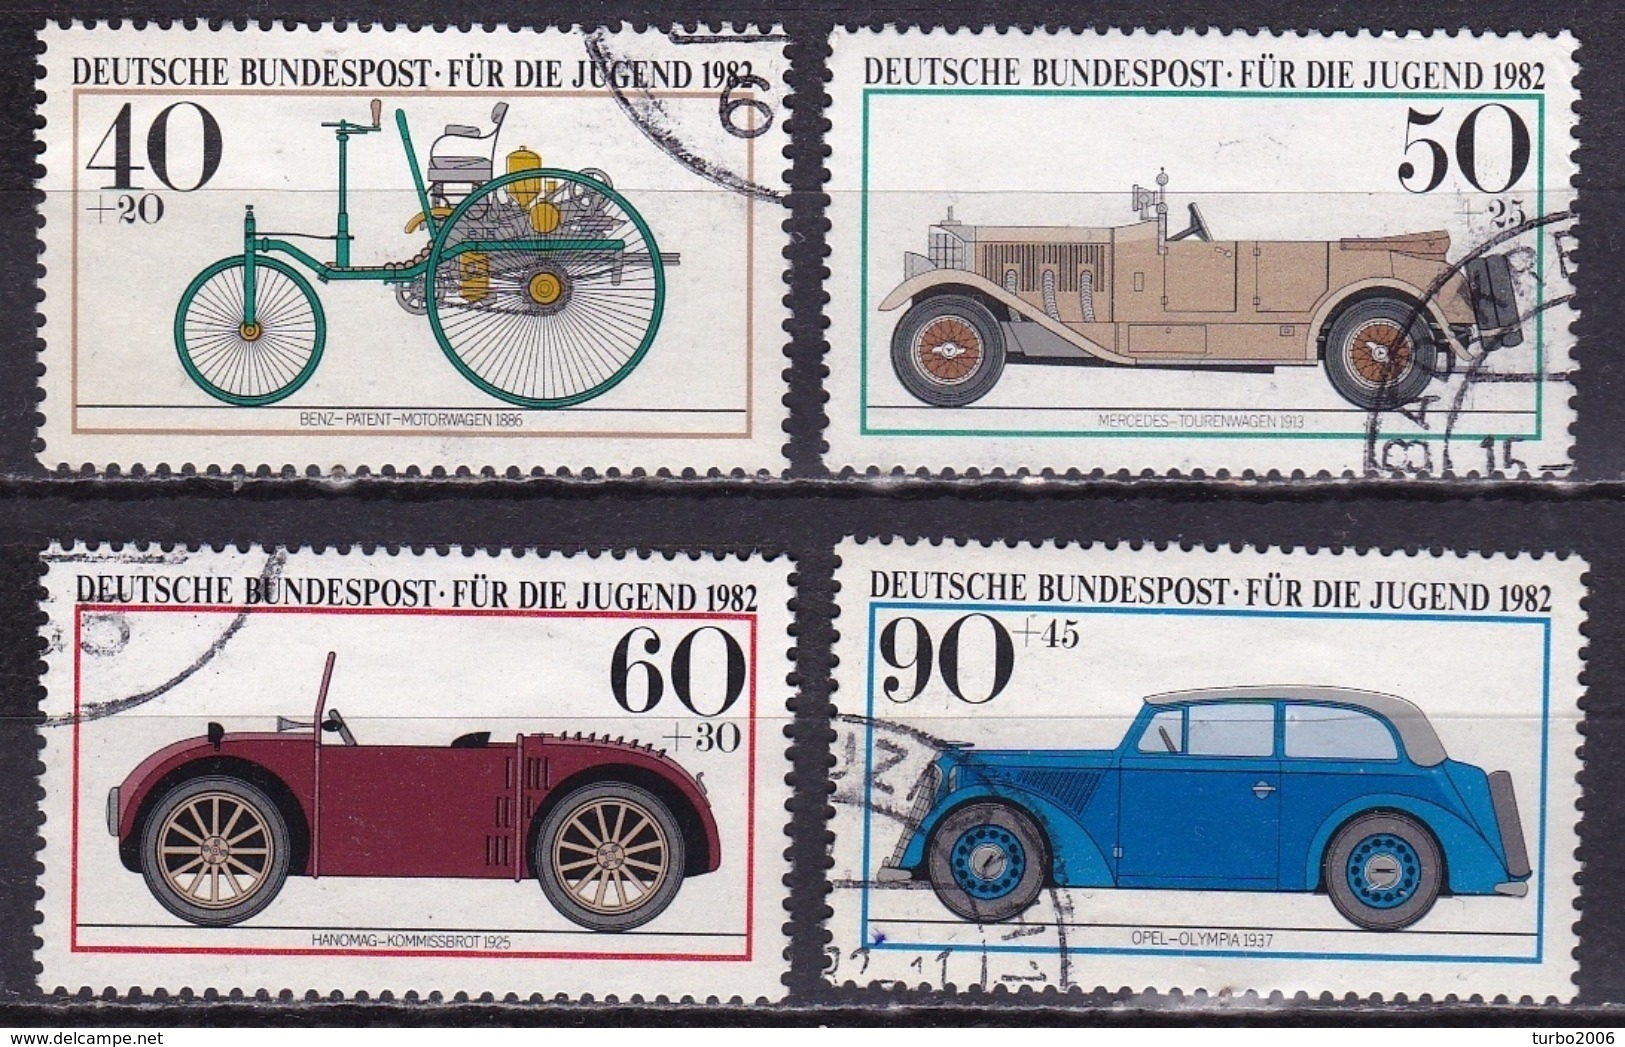 BRD 1982 Jugend Historische Kraftfahrzeuge Kompletter Satz Michel 1123 / 1126 - Gebruikt